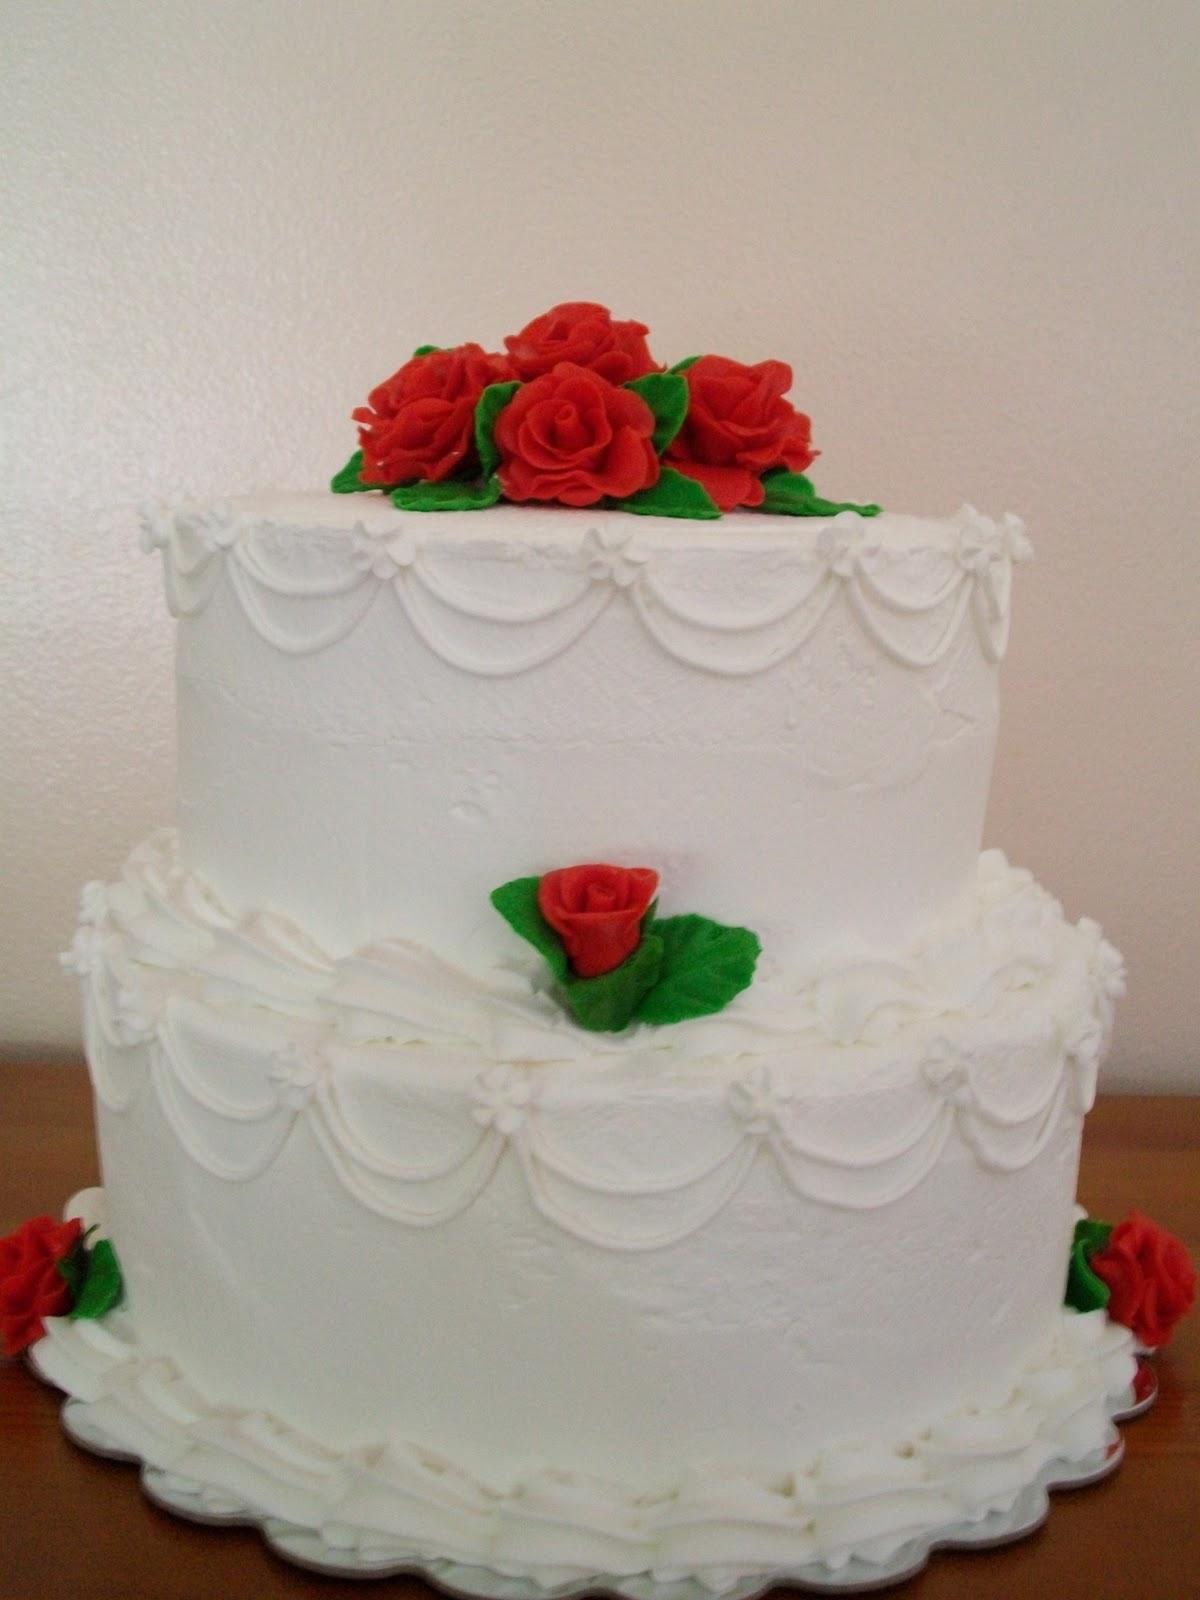 CAKES BY SHAMEKA: Red Rose Wedding cake w/ Buttercream